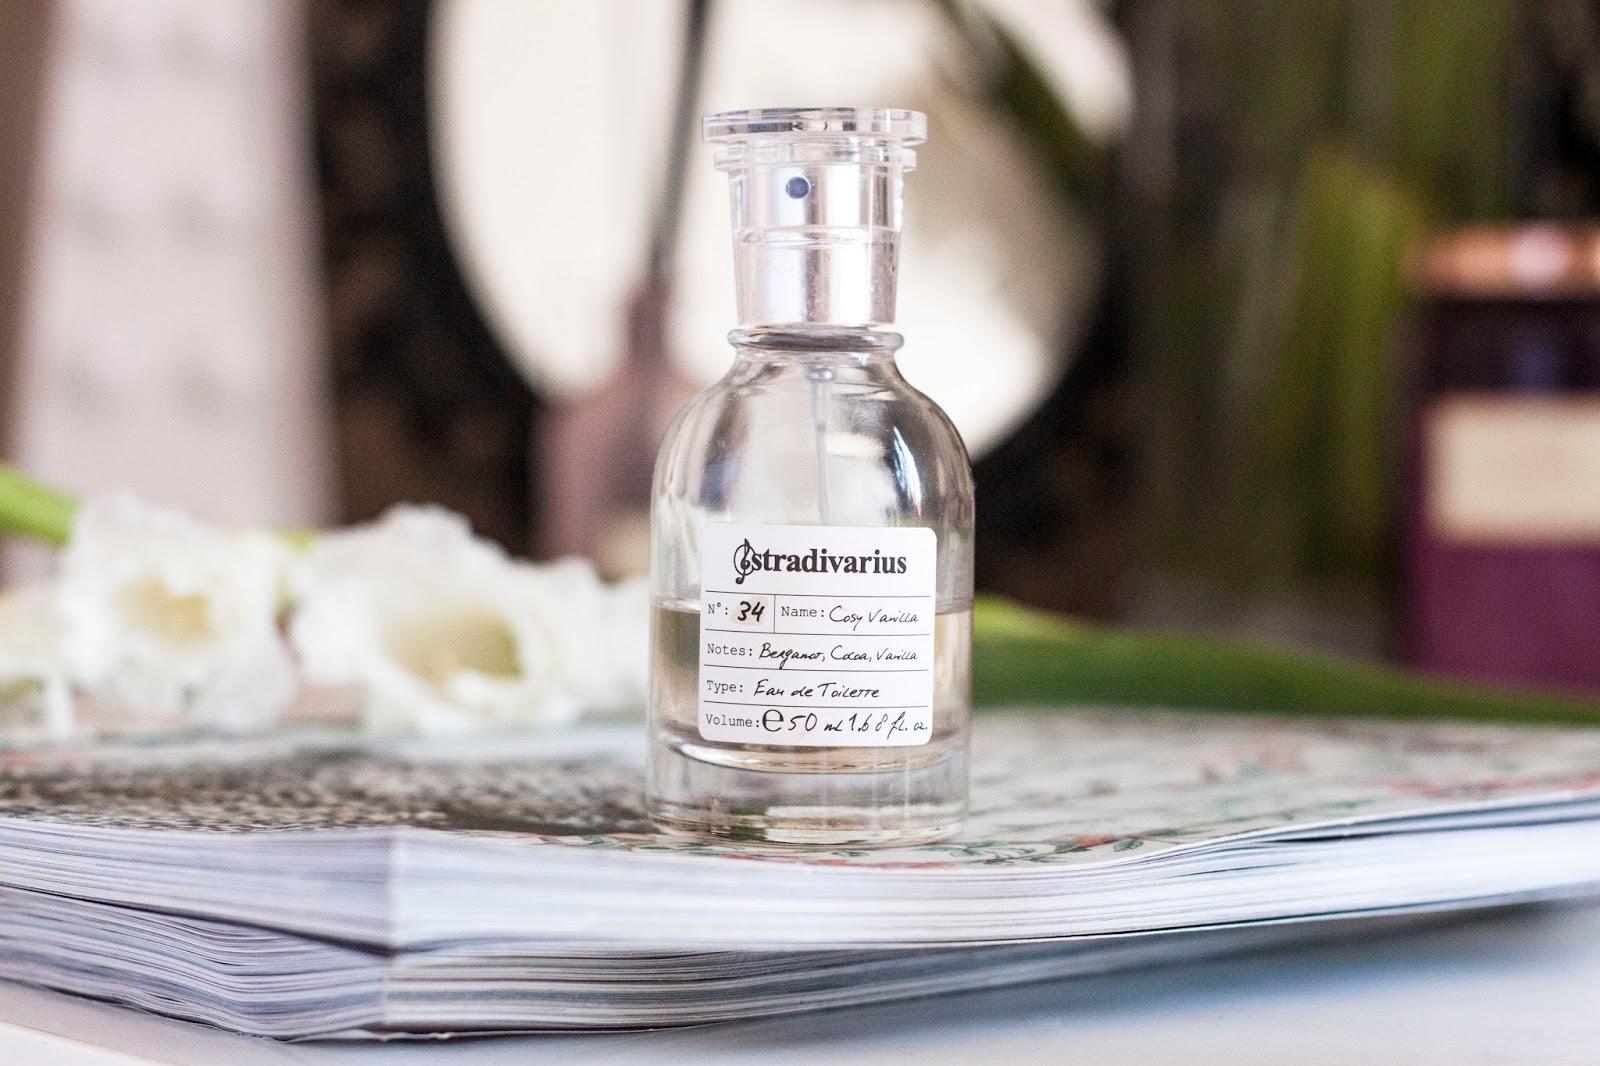 Image of the Stradivarius Cosy Vanilla perfume